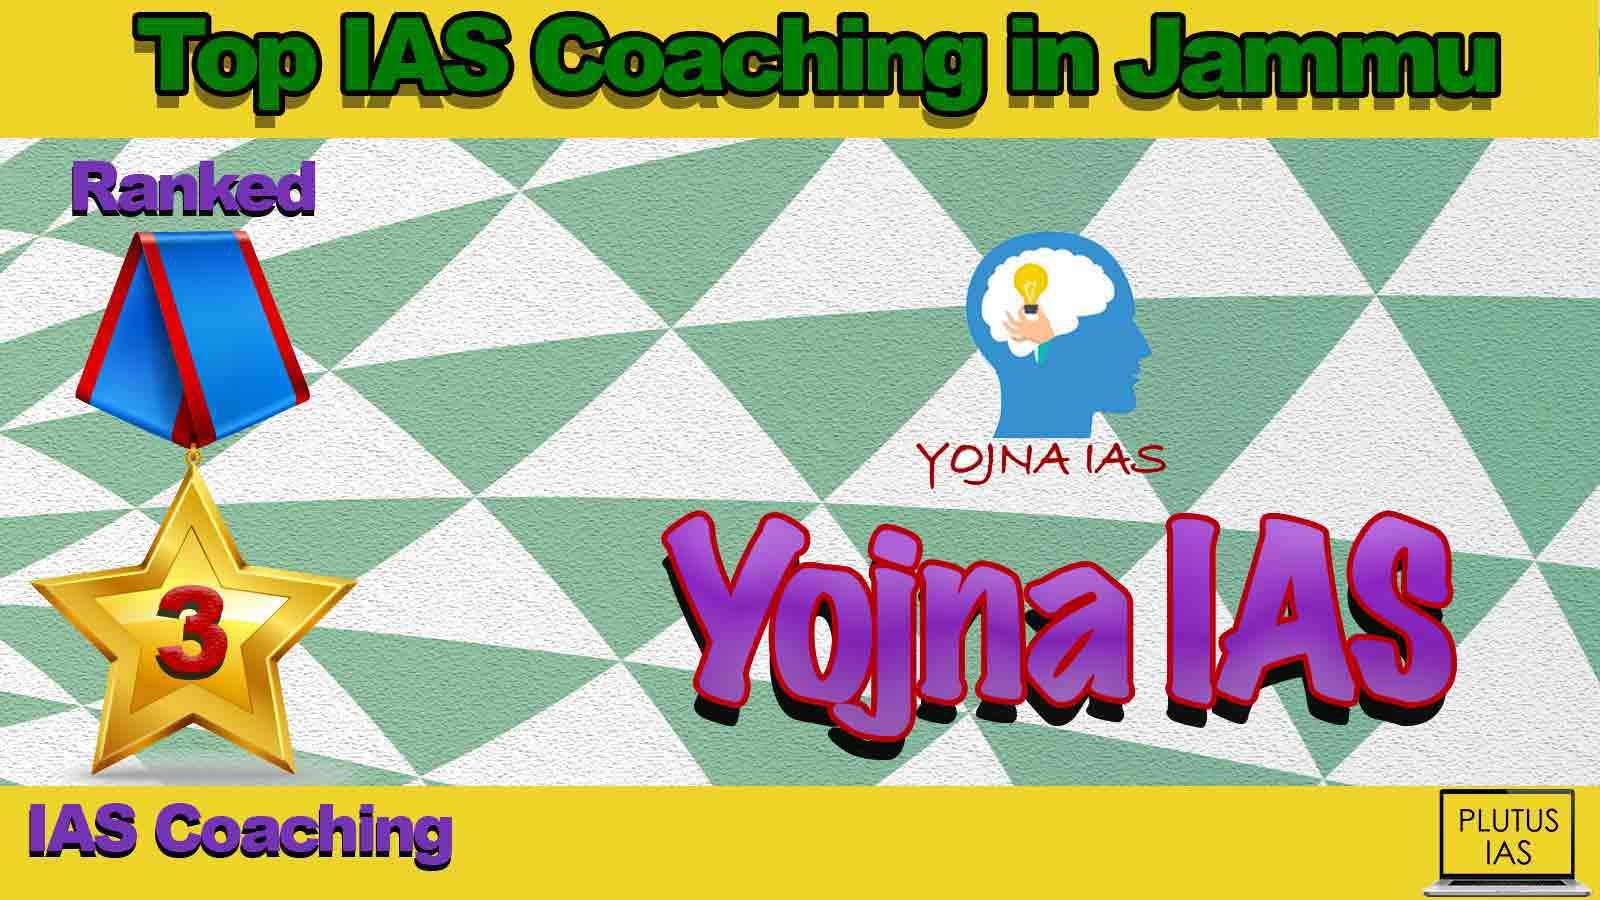 Top IAS Coaching in Jammu